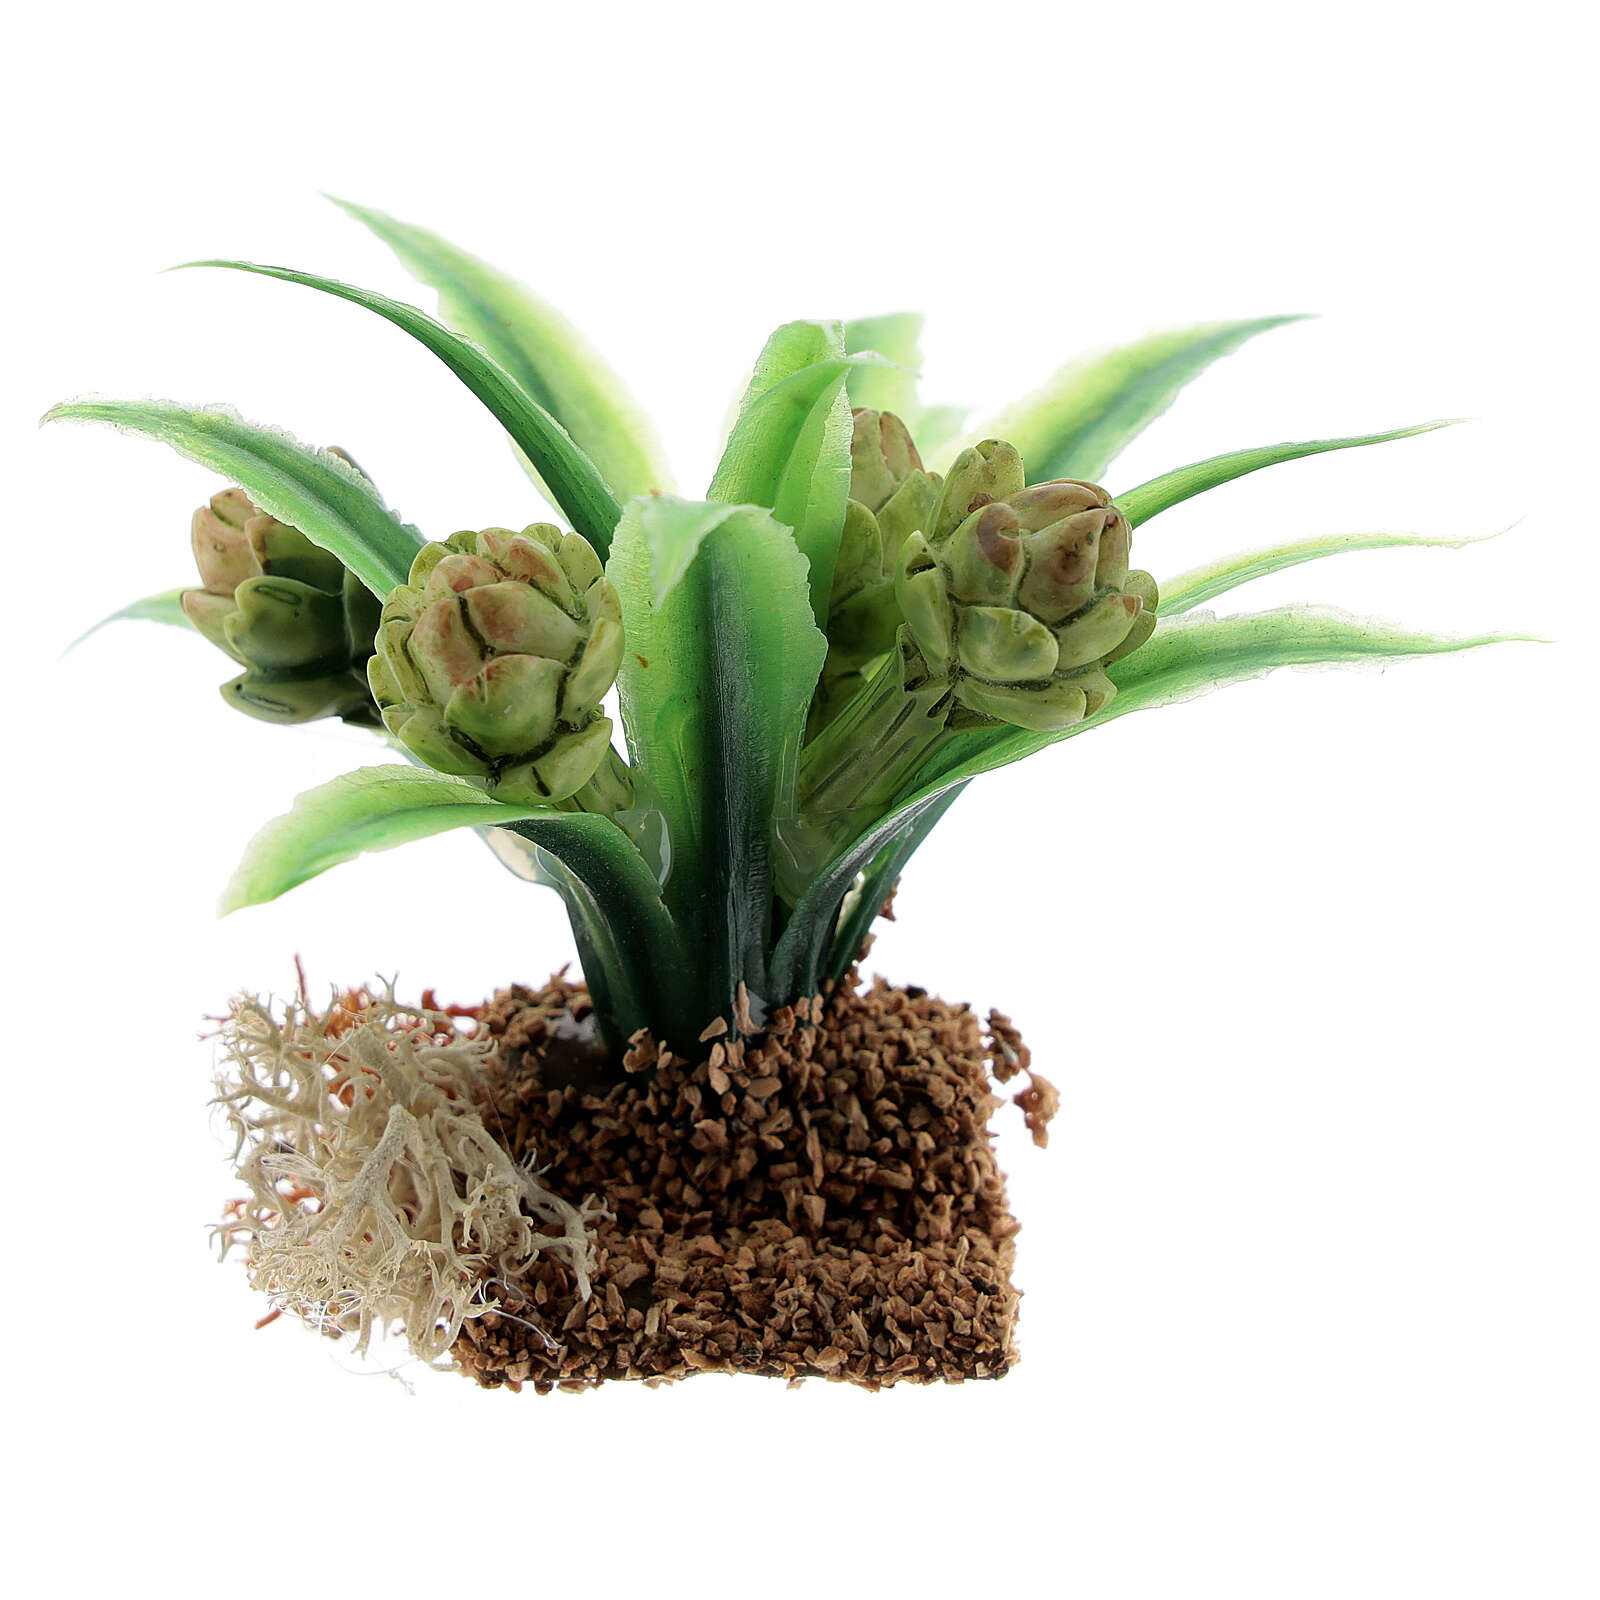 Artichoke plant 6 cm miniature Nativity scene 12-14 cm 4